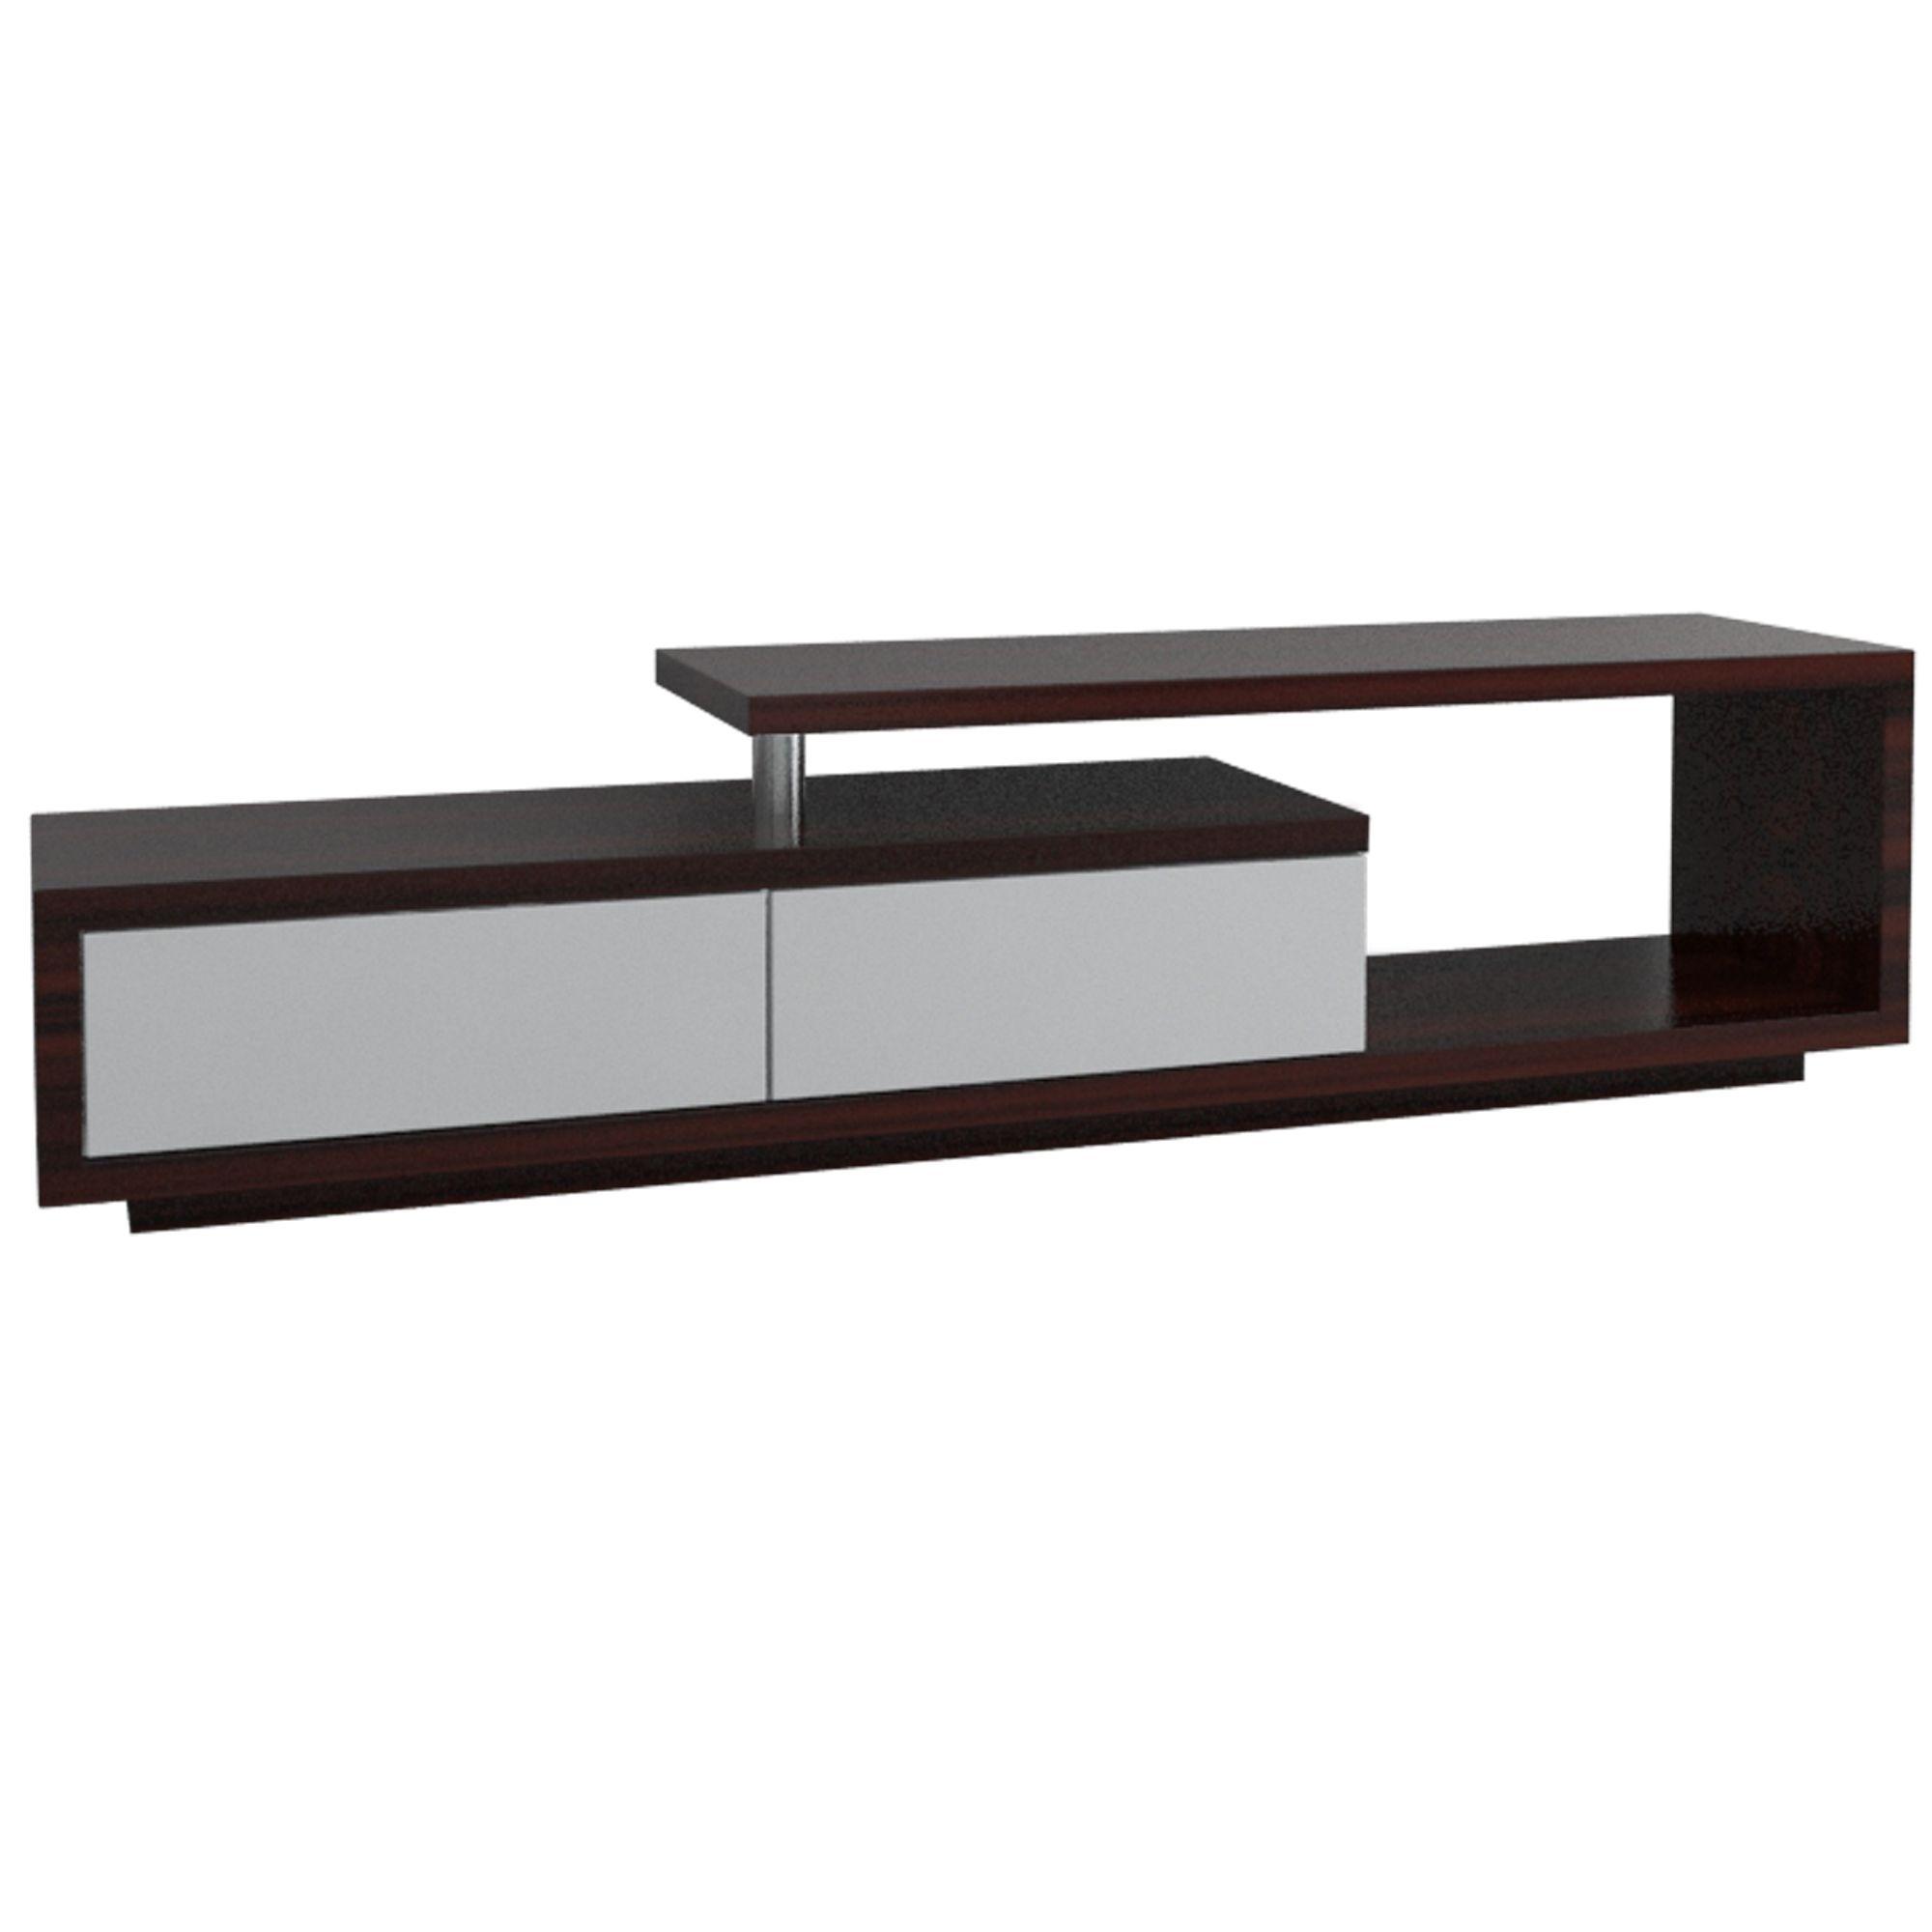 Haye Living Room Furniture Buy Online Jumia Nigeria